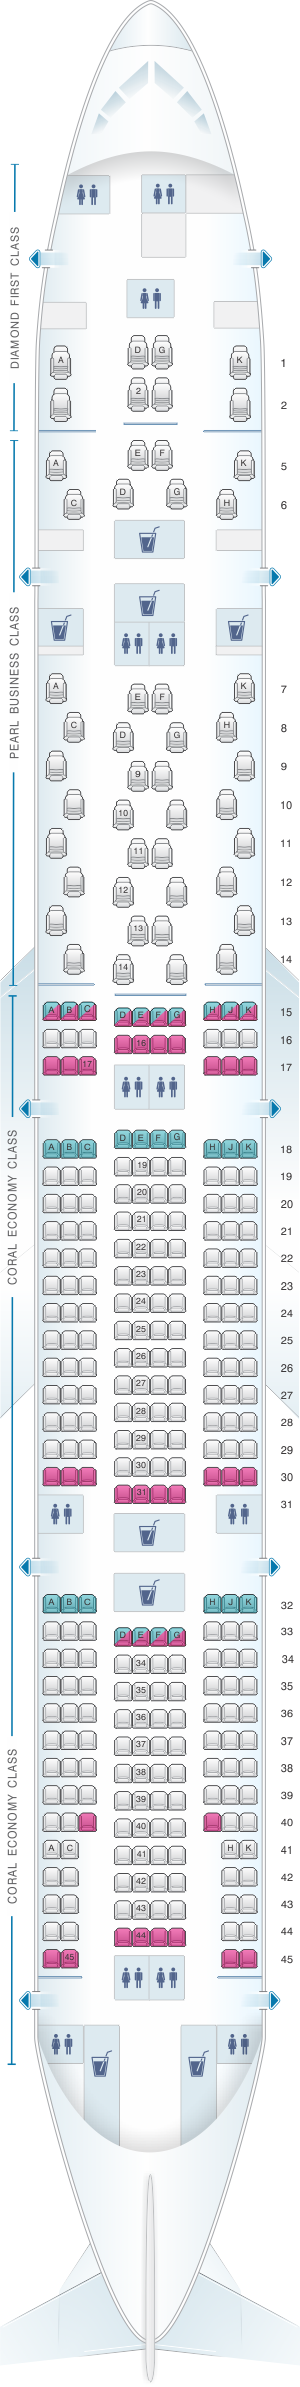 Seat map for Etihad Airways Boeing B777 300ER 3 class